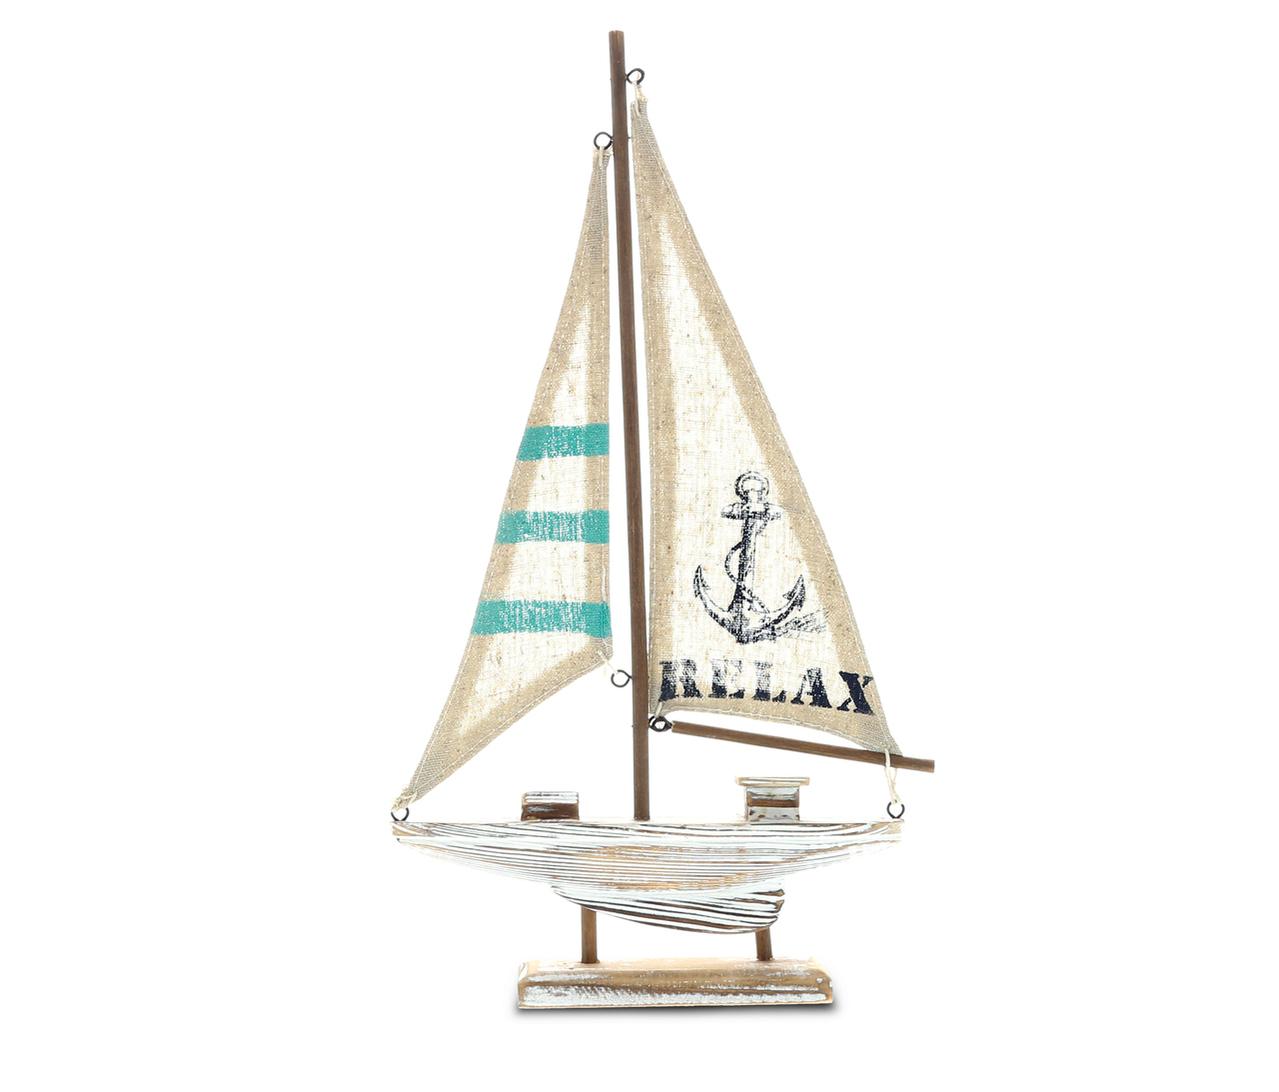 Nautical Decor CoTa Global Aquarius Sailboat Decorative Home Accent